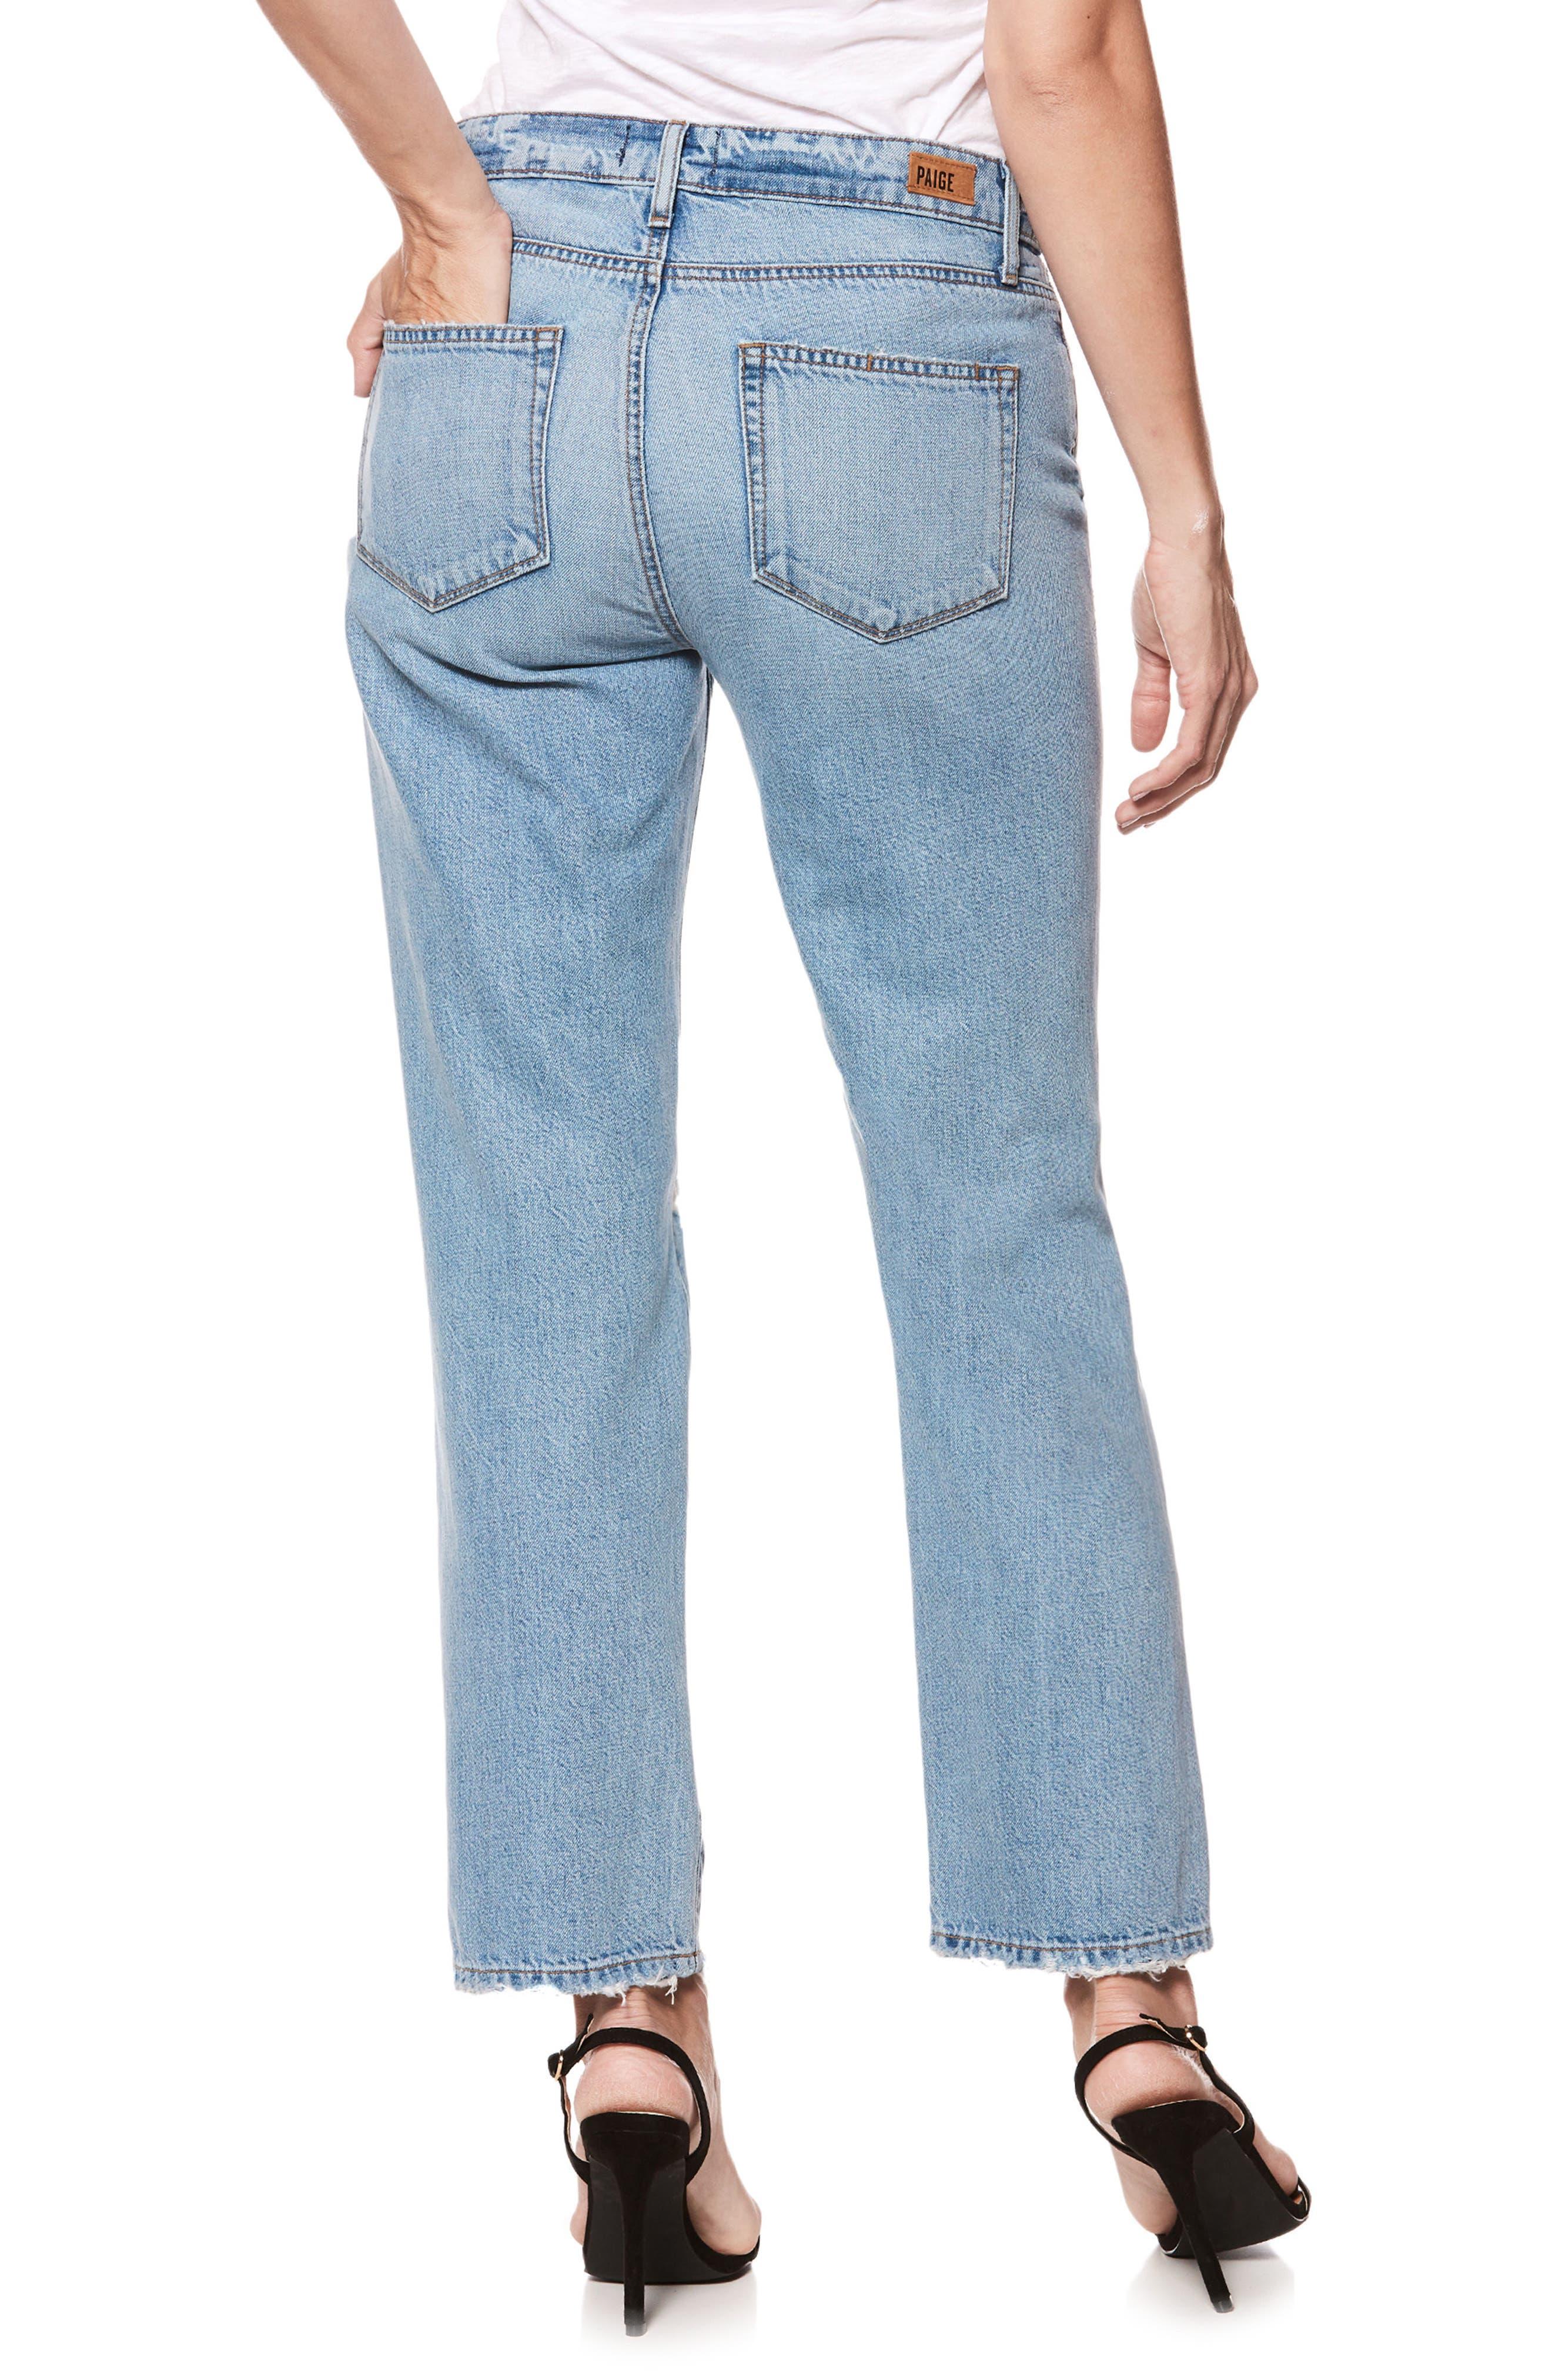 Noella Ripped Straight Leg Jeans,                             Alternate thumbnail 2, color,                             400